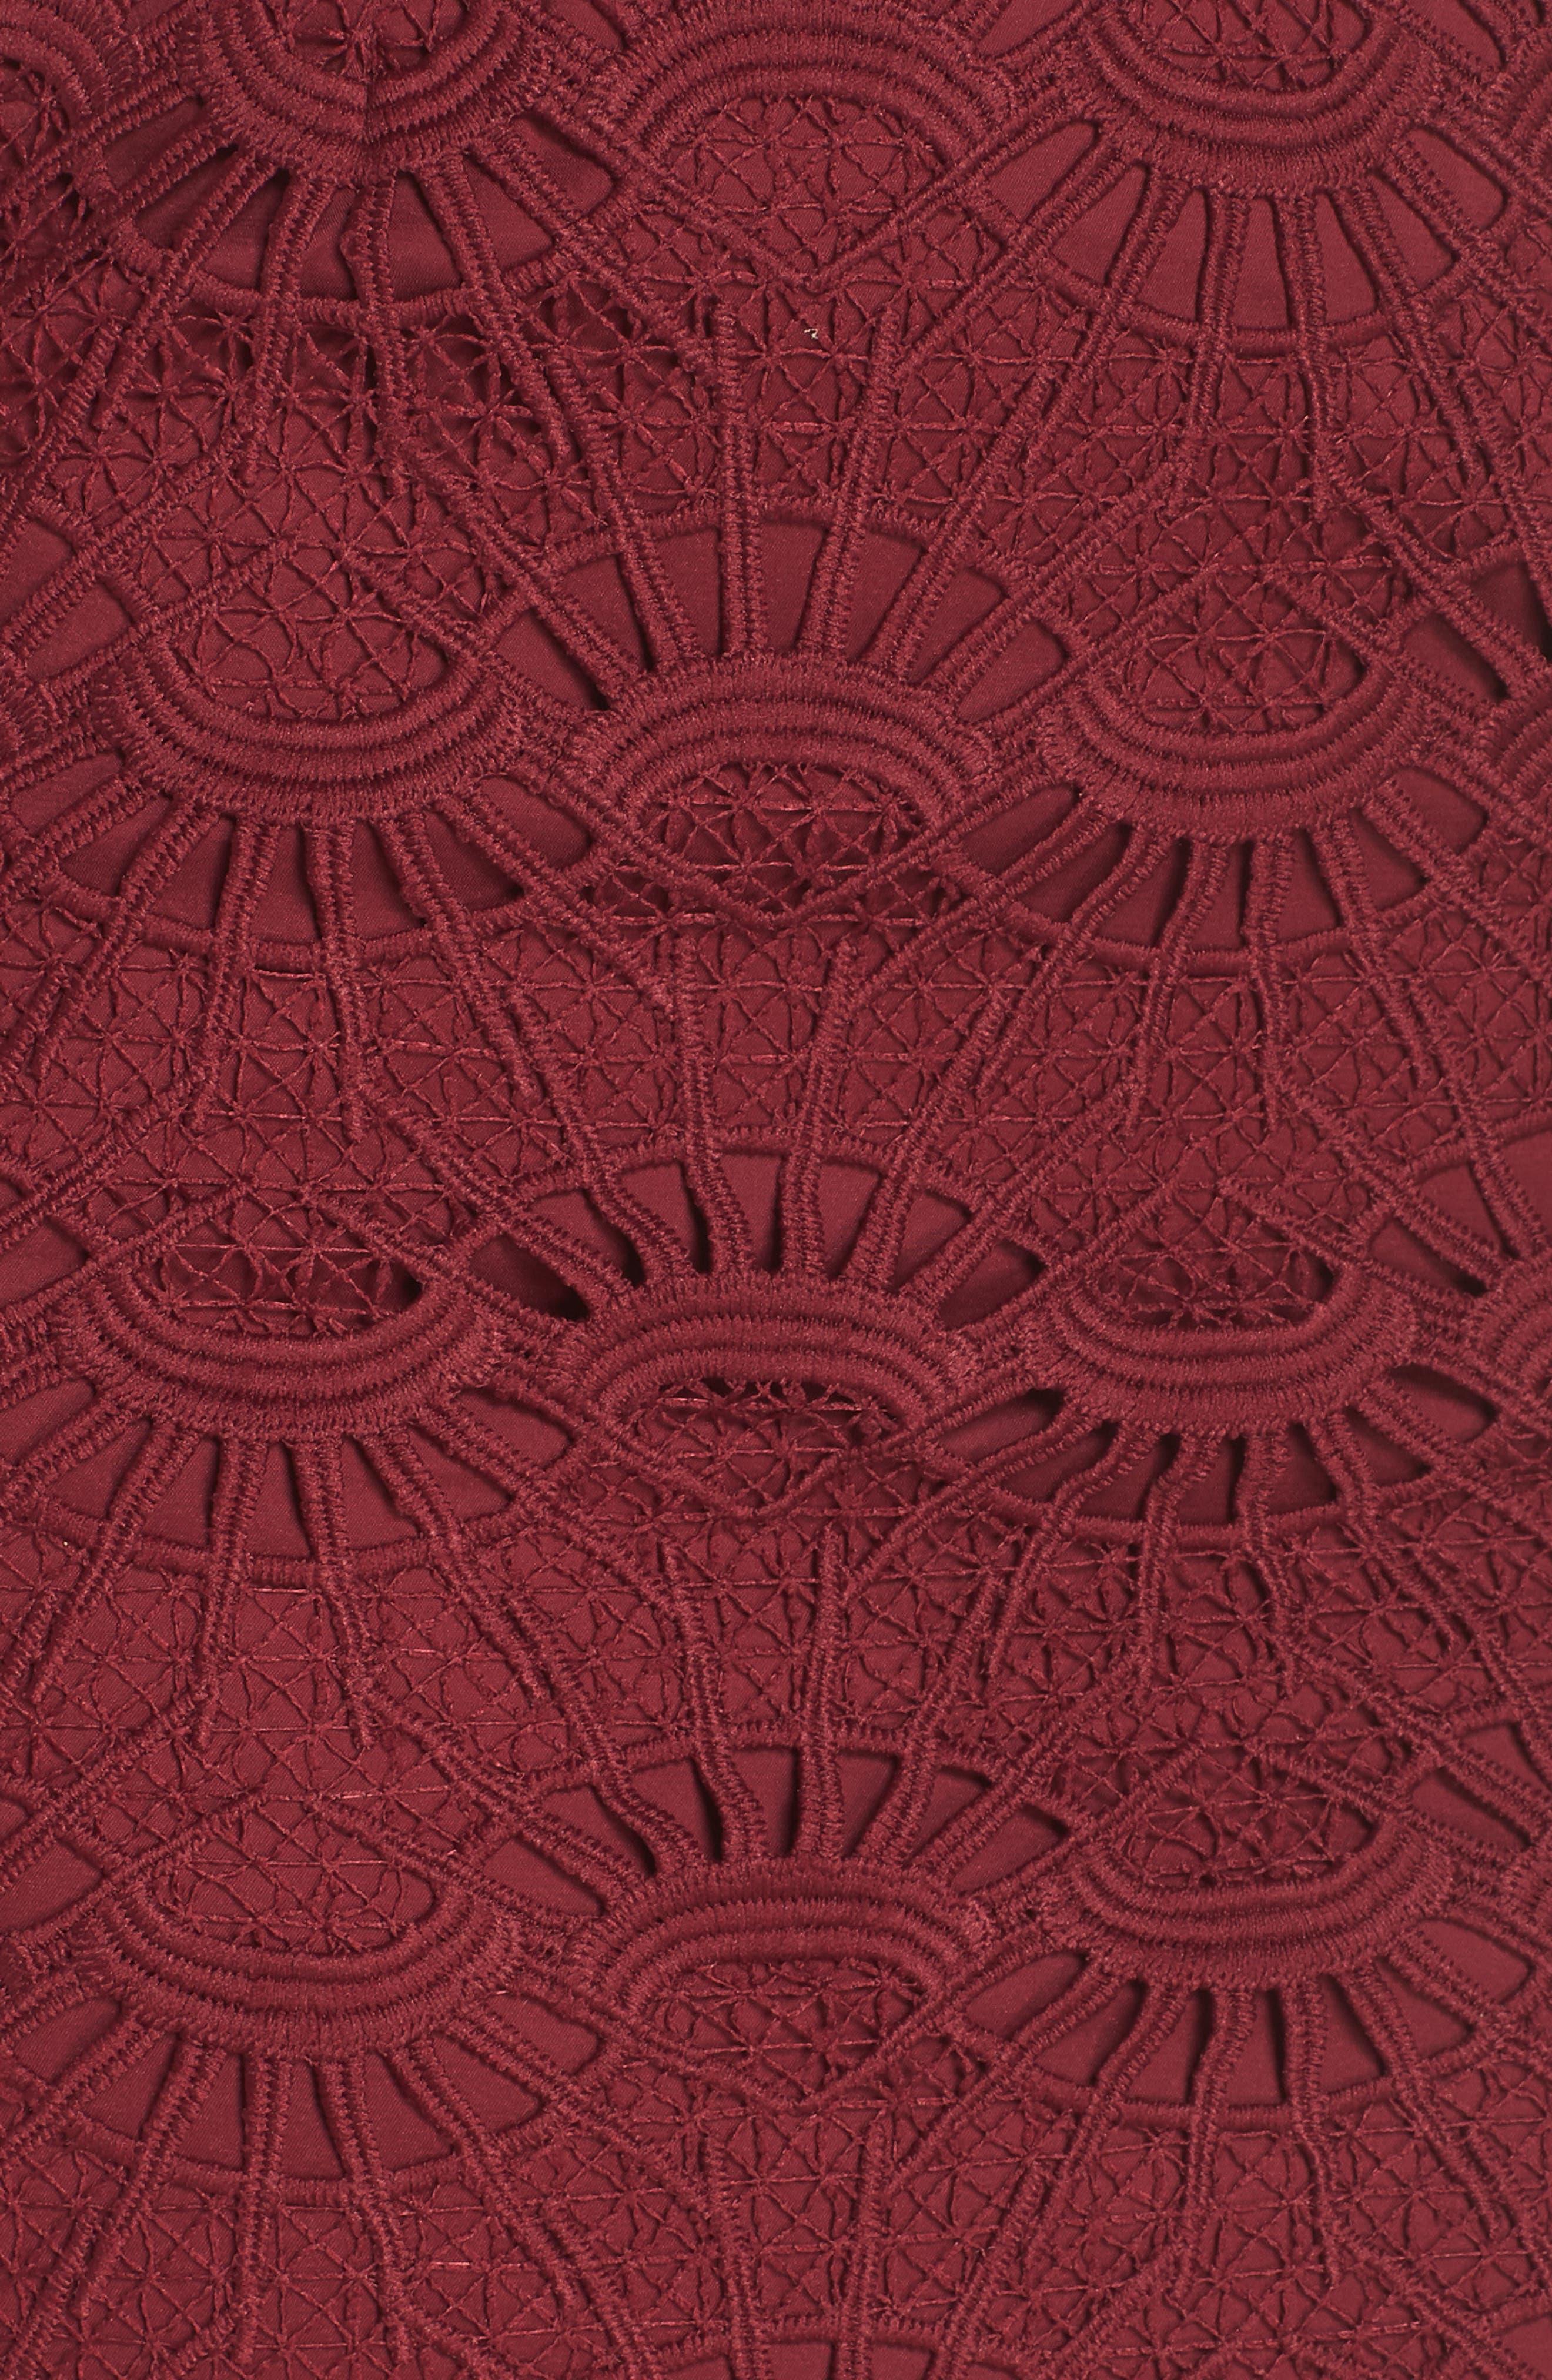 Mariano Lace Sheath Dress,                             Alternate thumbnail 7, color,                             601